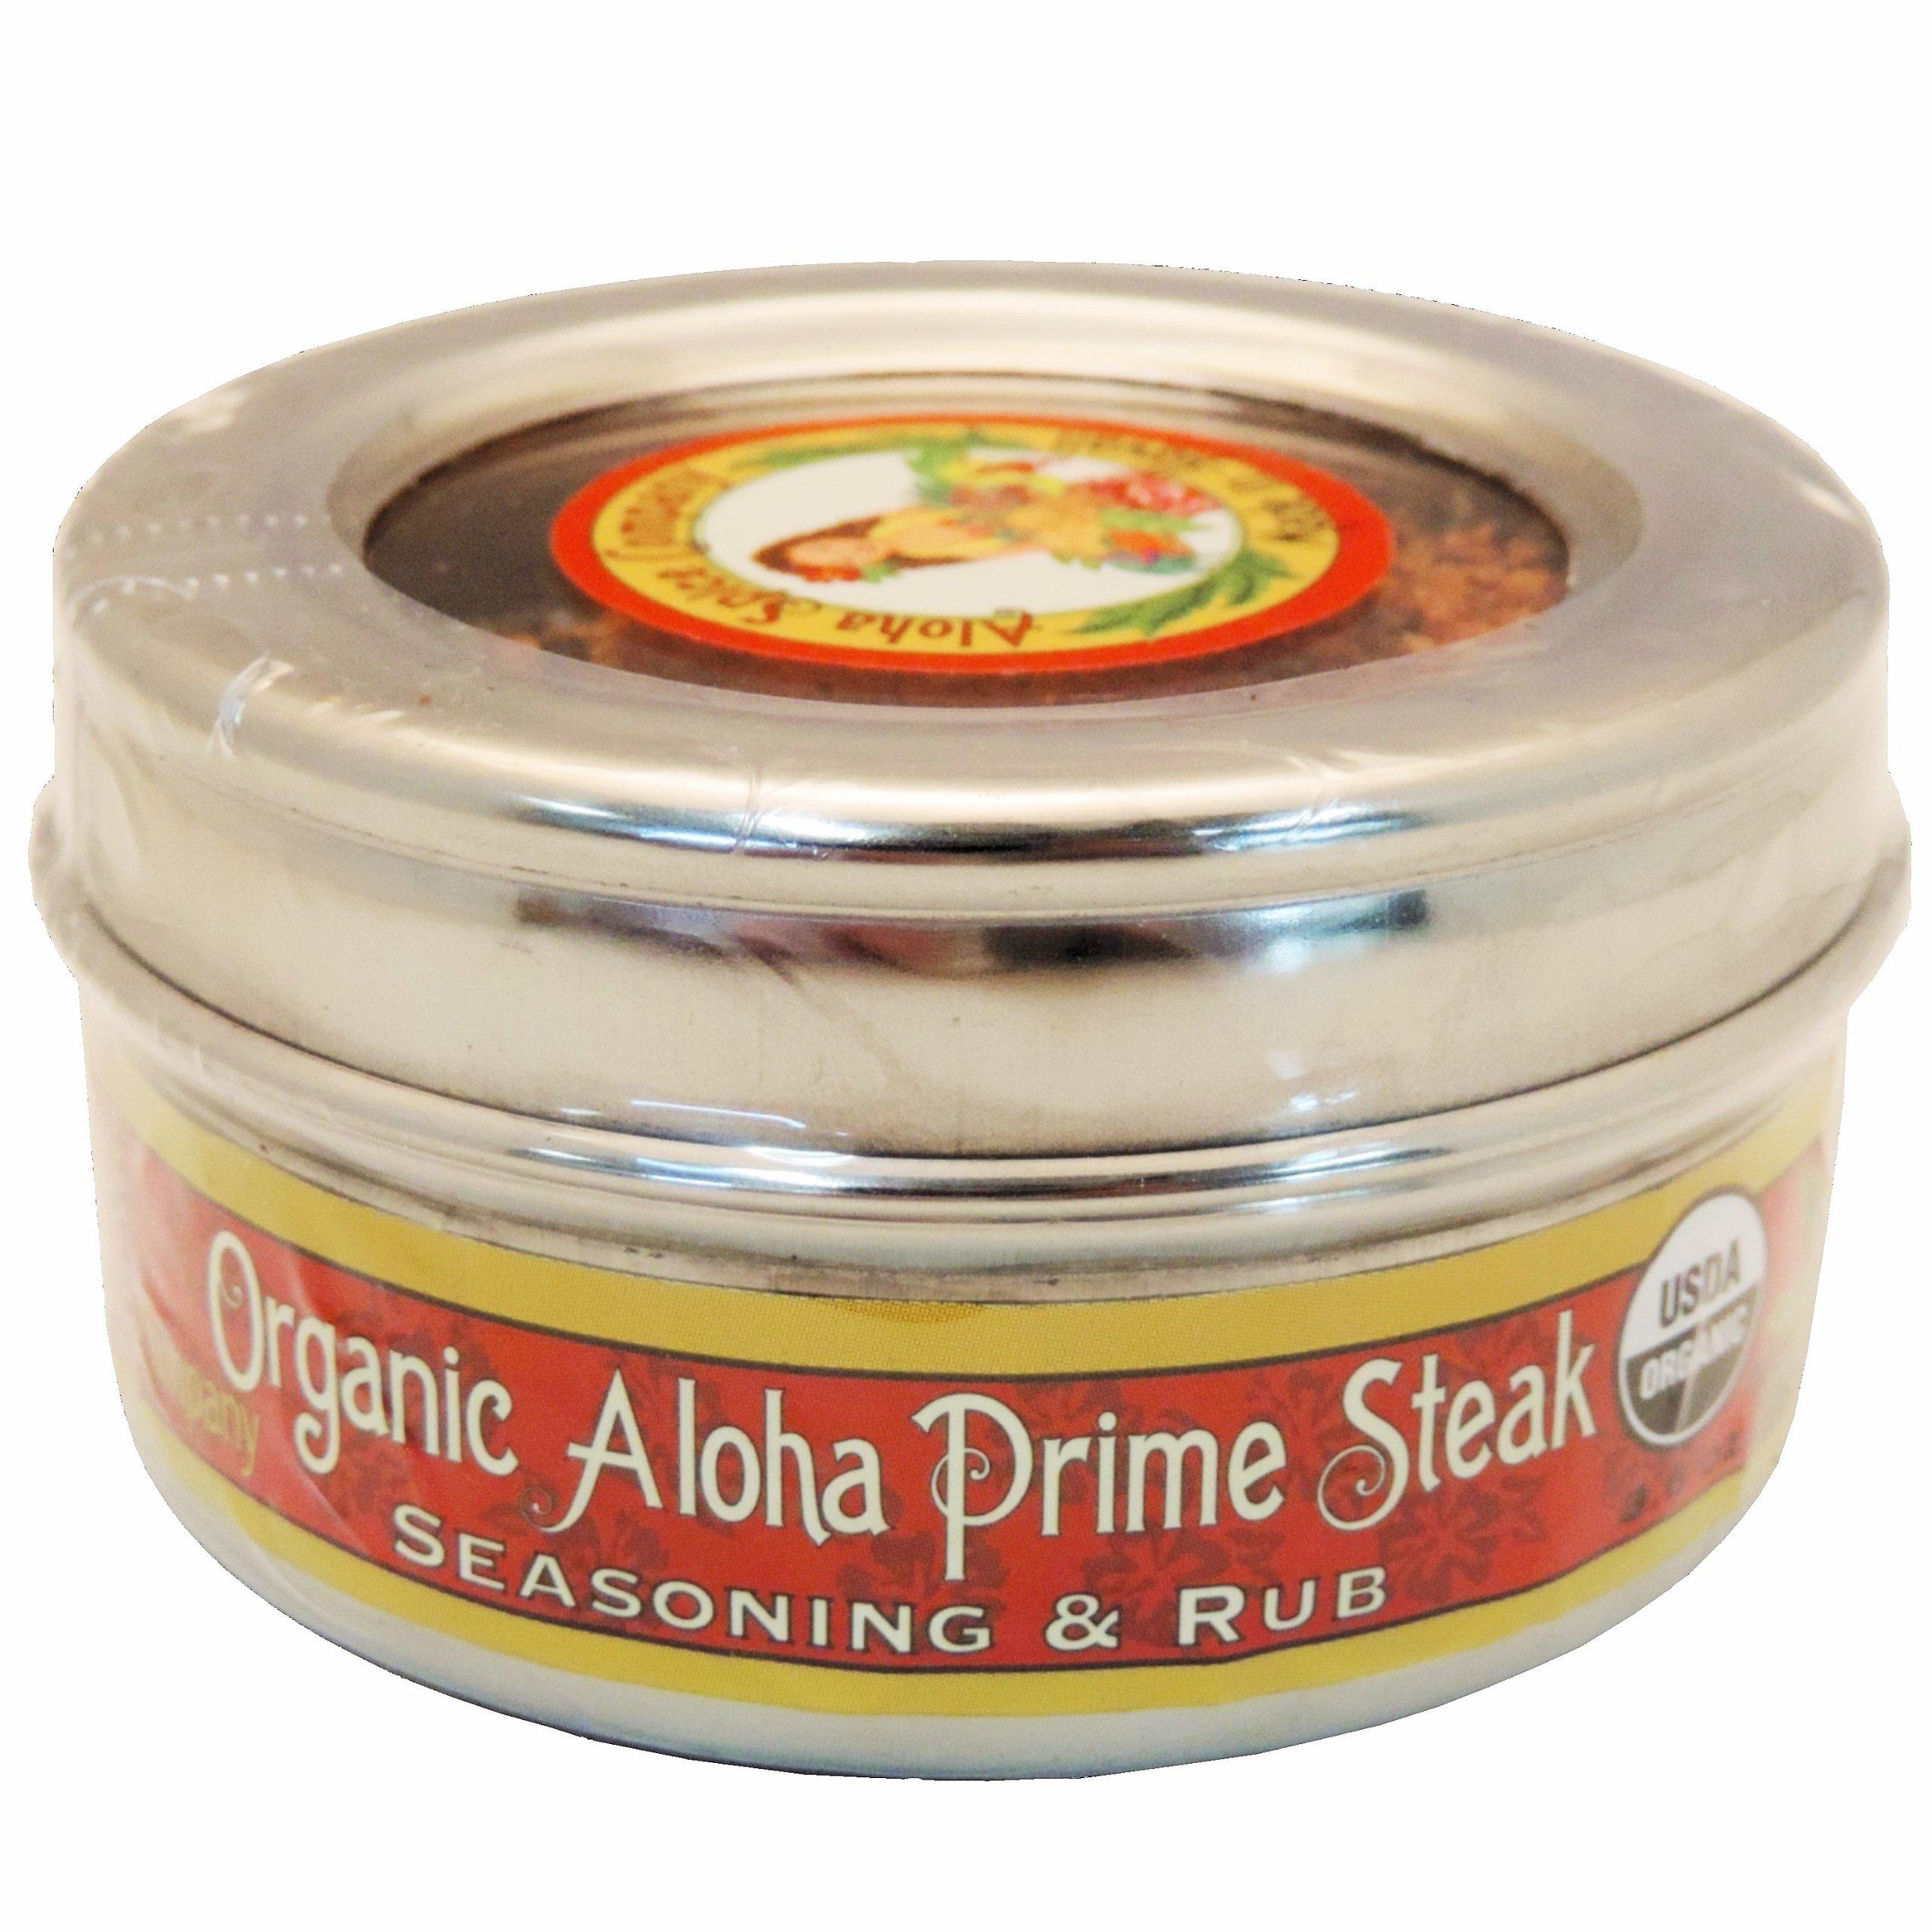 Organic Aloha Prime Steak Seasoning & Rub (2 Pack)